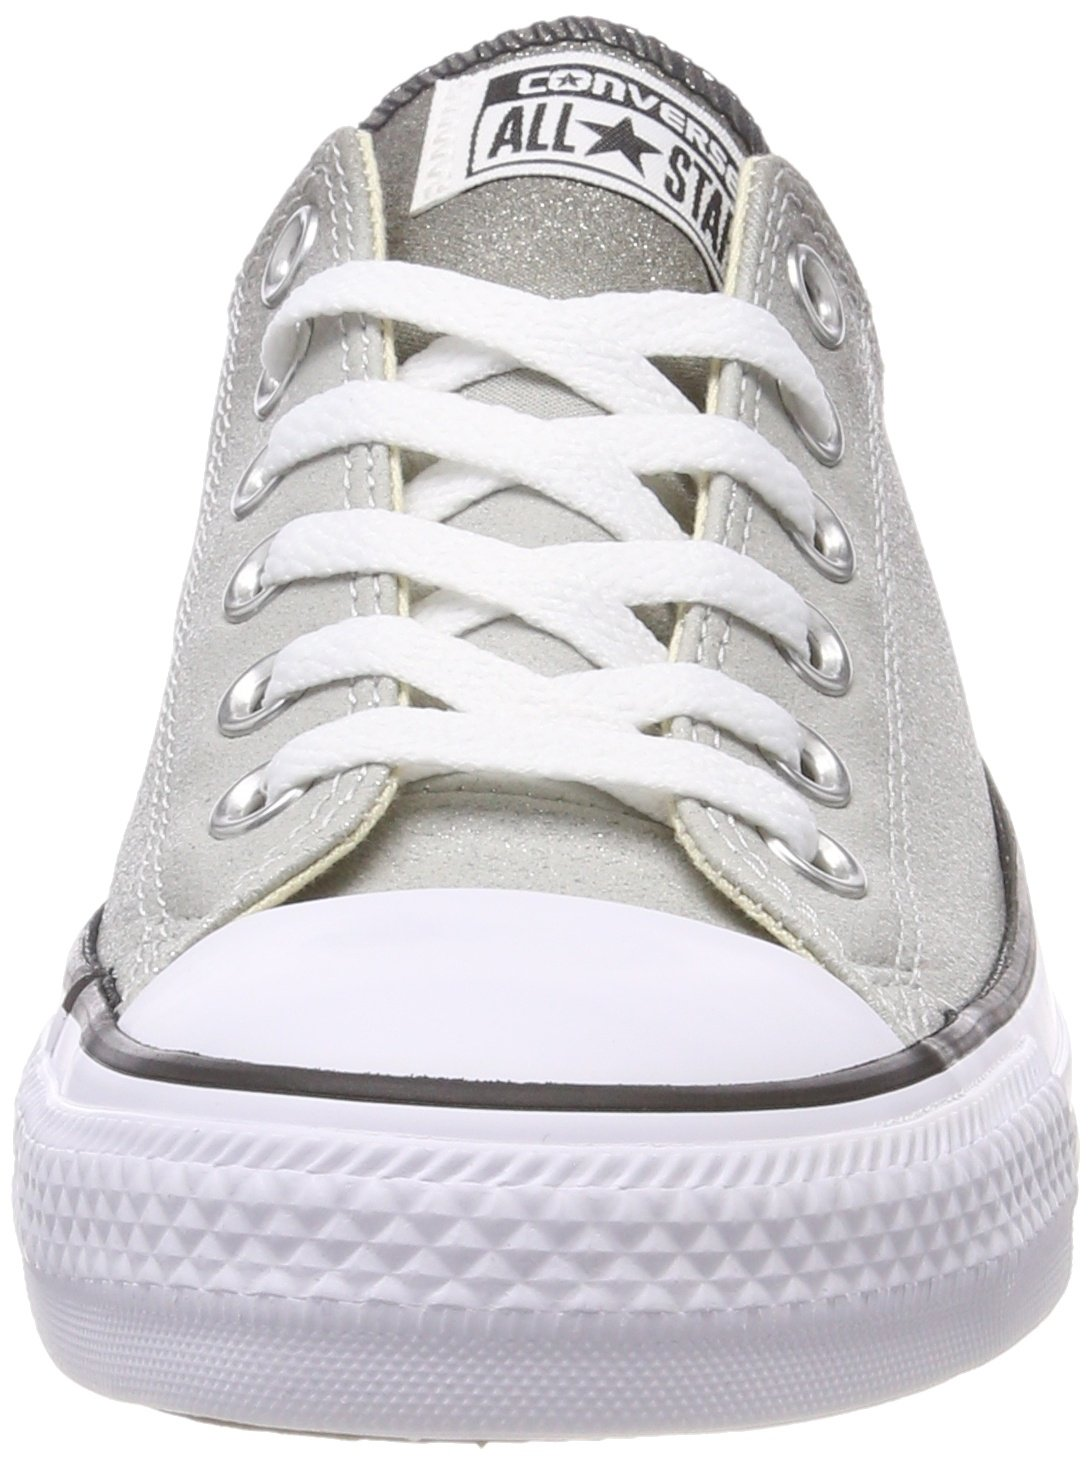 Converse Womens Chuck Taylor All Star Ombre Metallic Sneaker B07367KHMS 4.5 D(M) US / 6.5 B(M) US|Ash Grey/Black/White